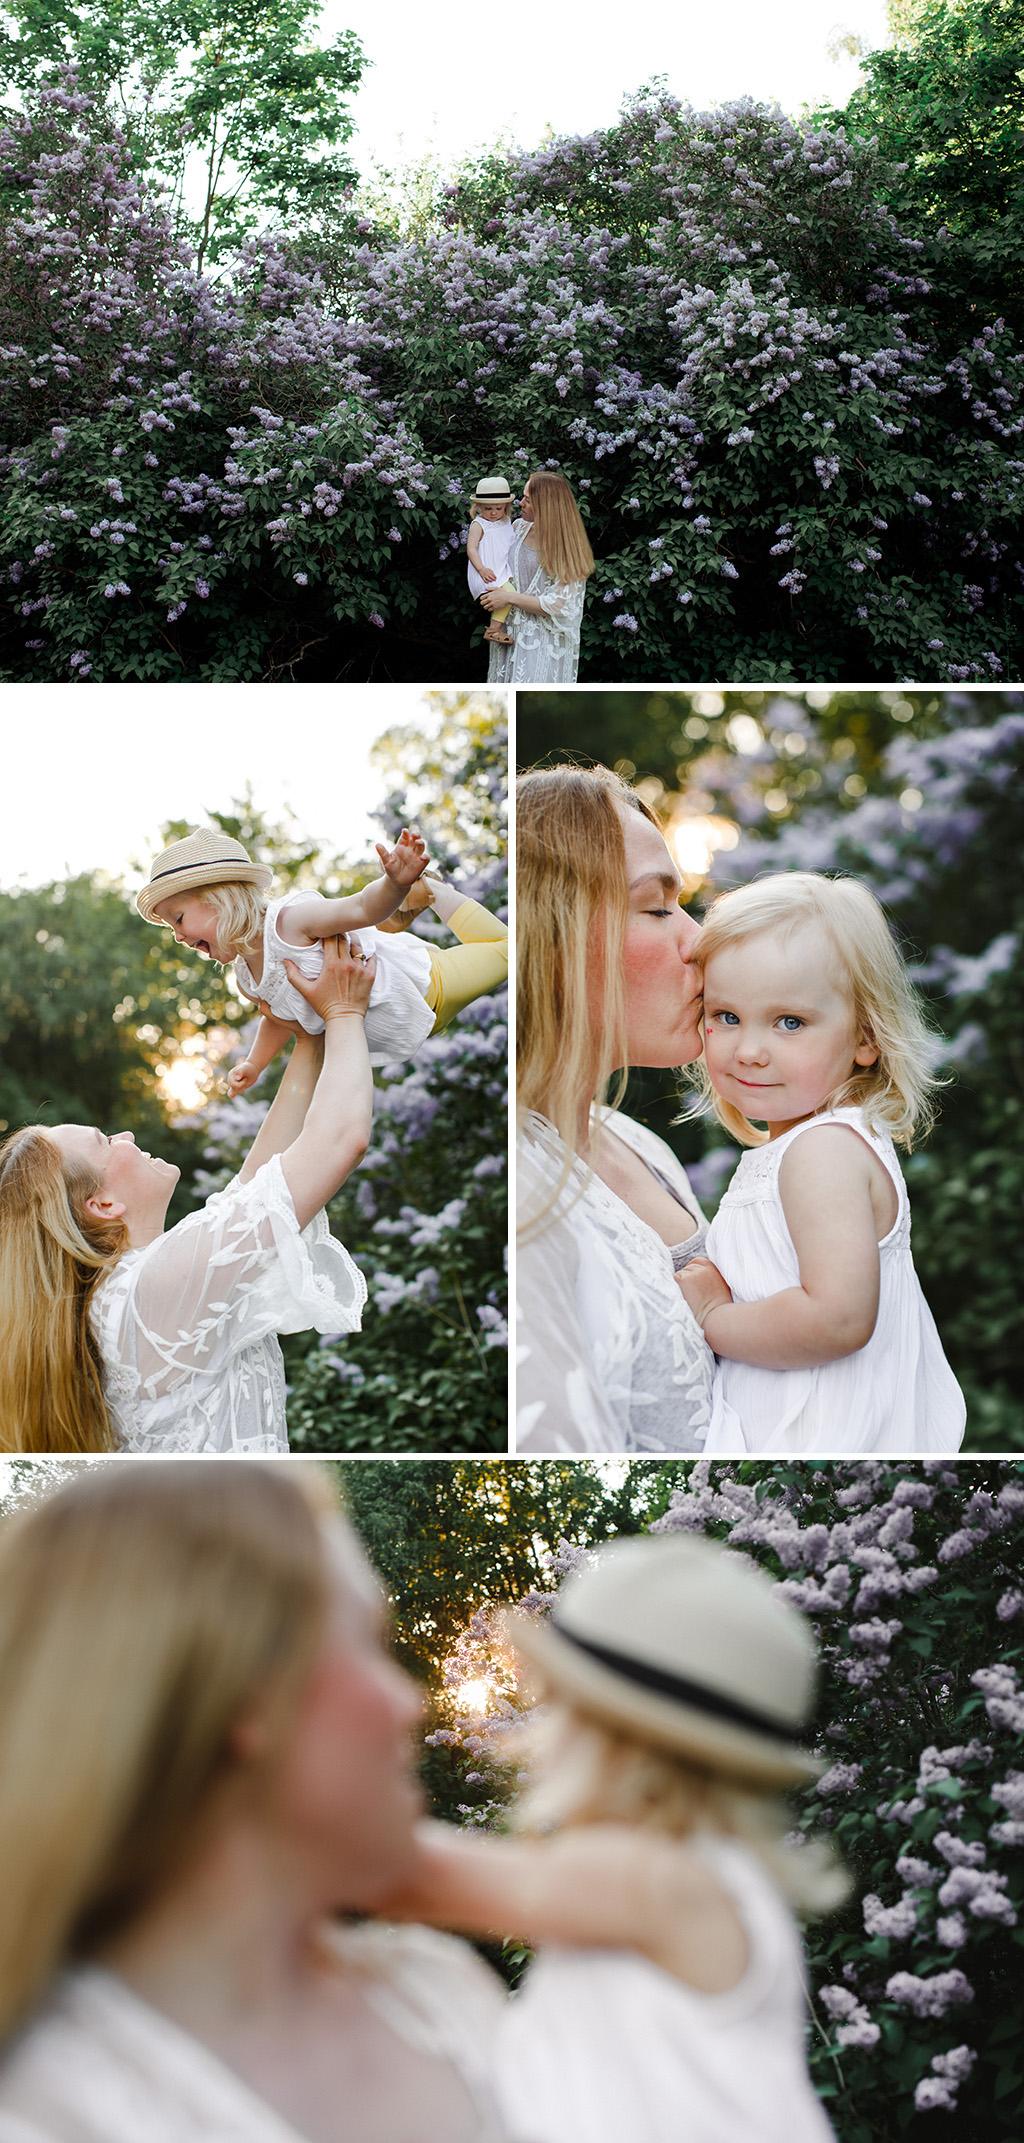 Familjefotograf_Stockholm_Syrener_familjefotografering.jpg